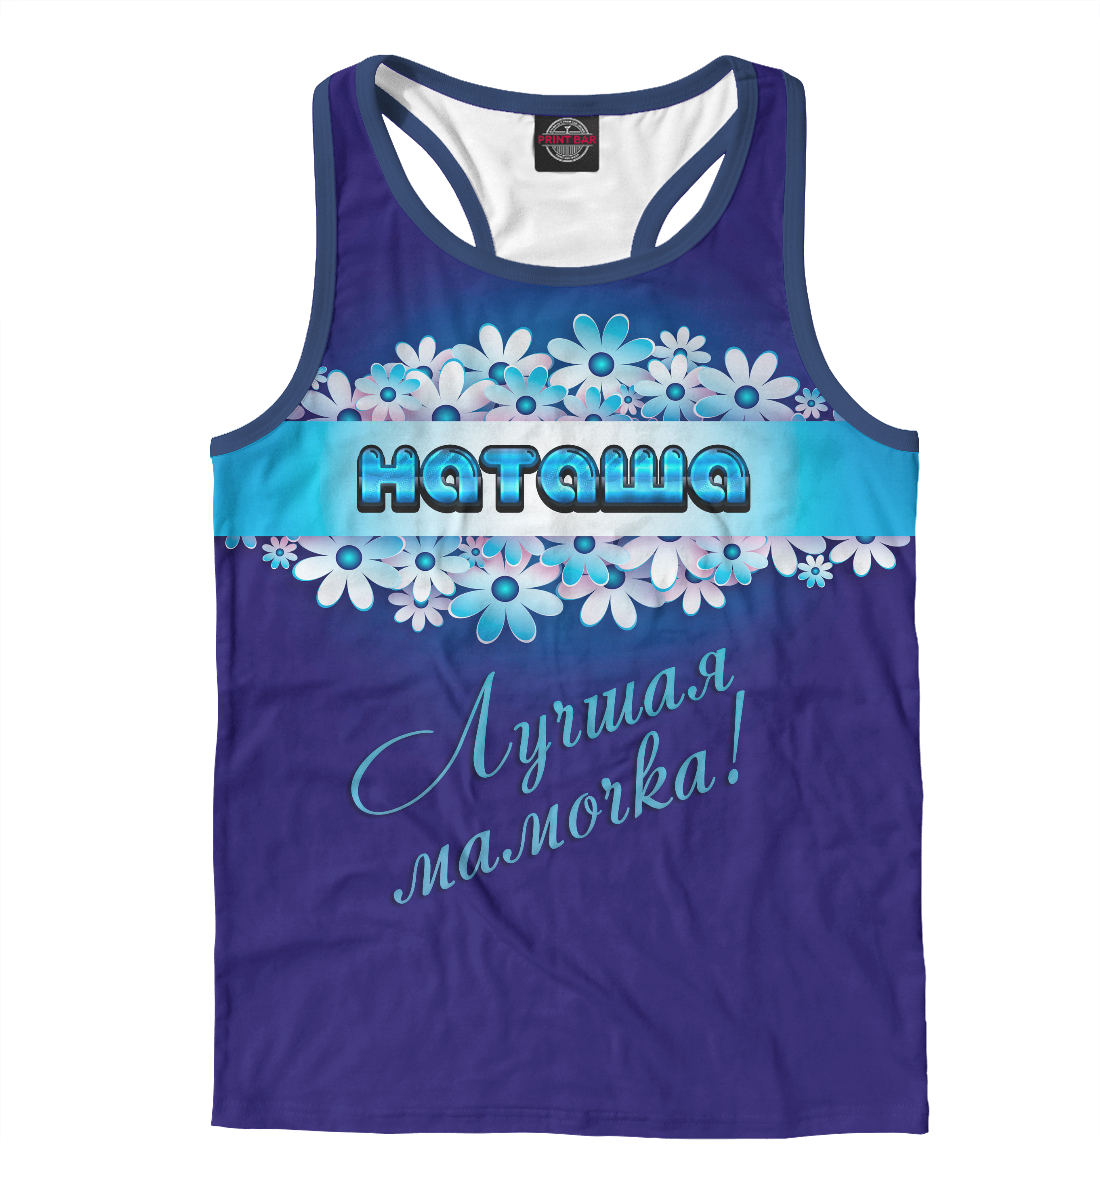 Купить Лучшая мамочка Наташа, Printbar, Майки борцовки, IMR-528488-mayb-2